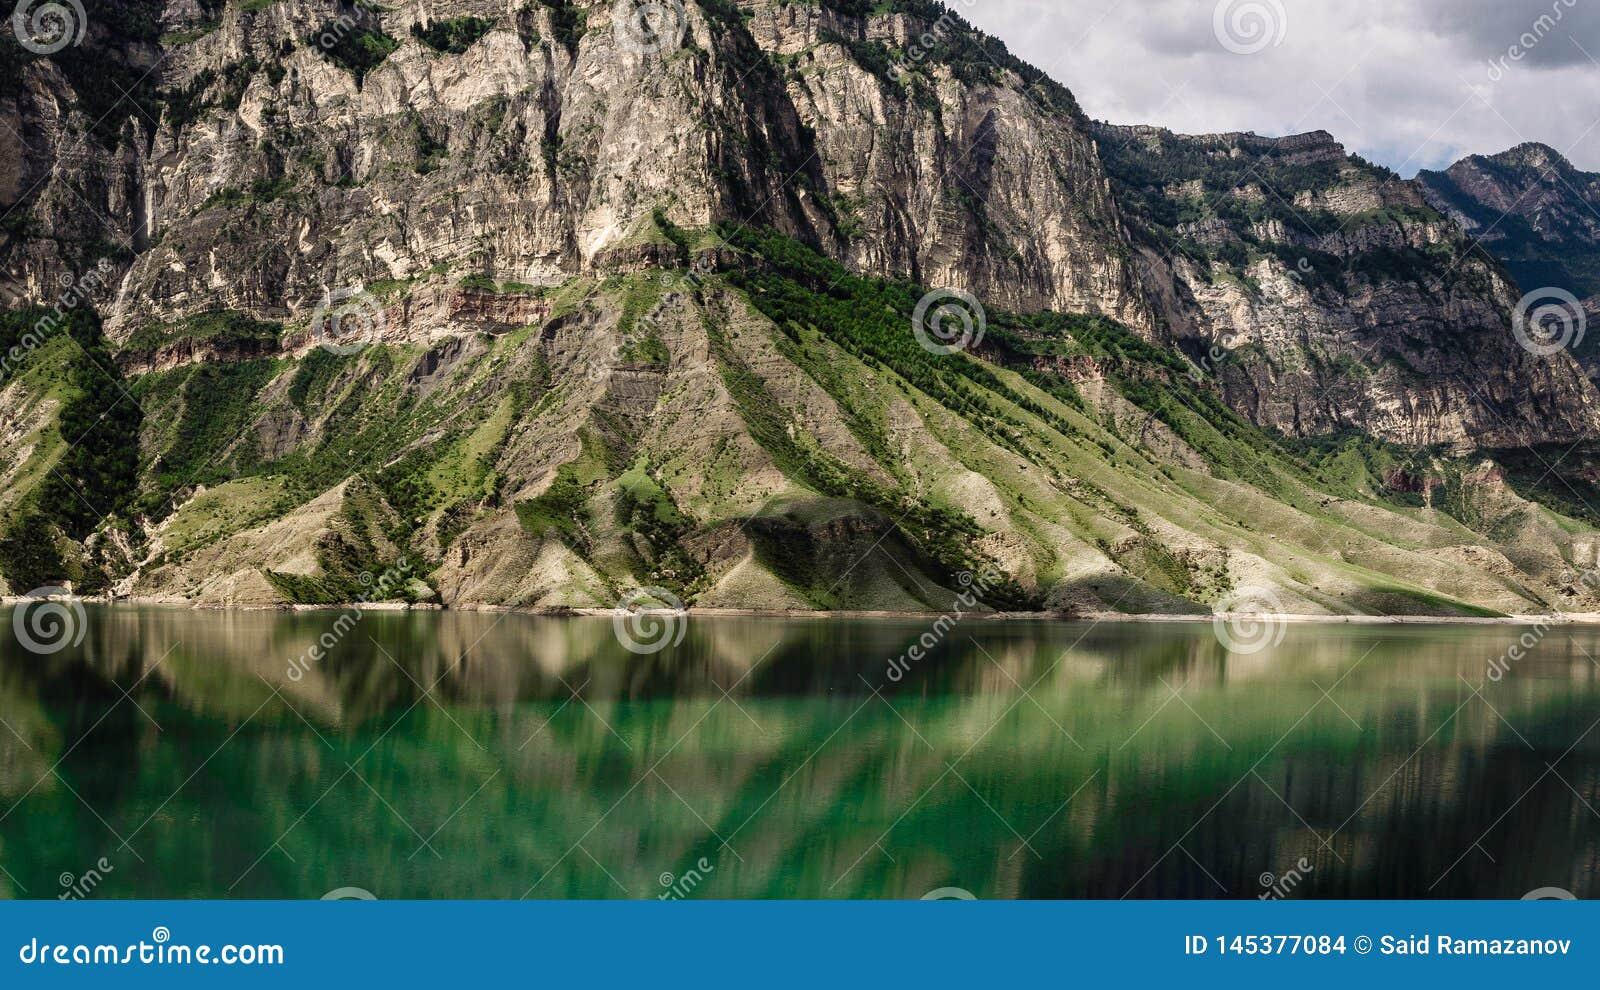 Mountains and lake. Gunib district of Dagestan